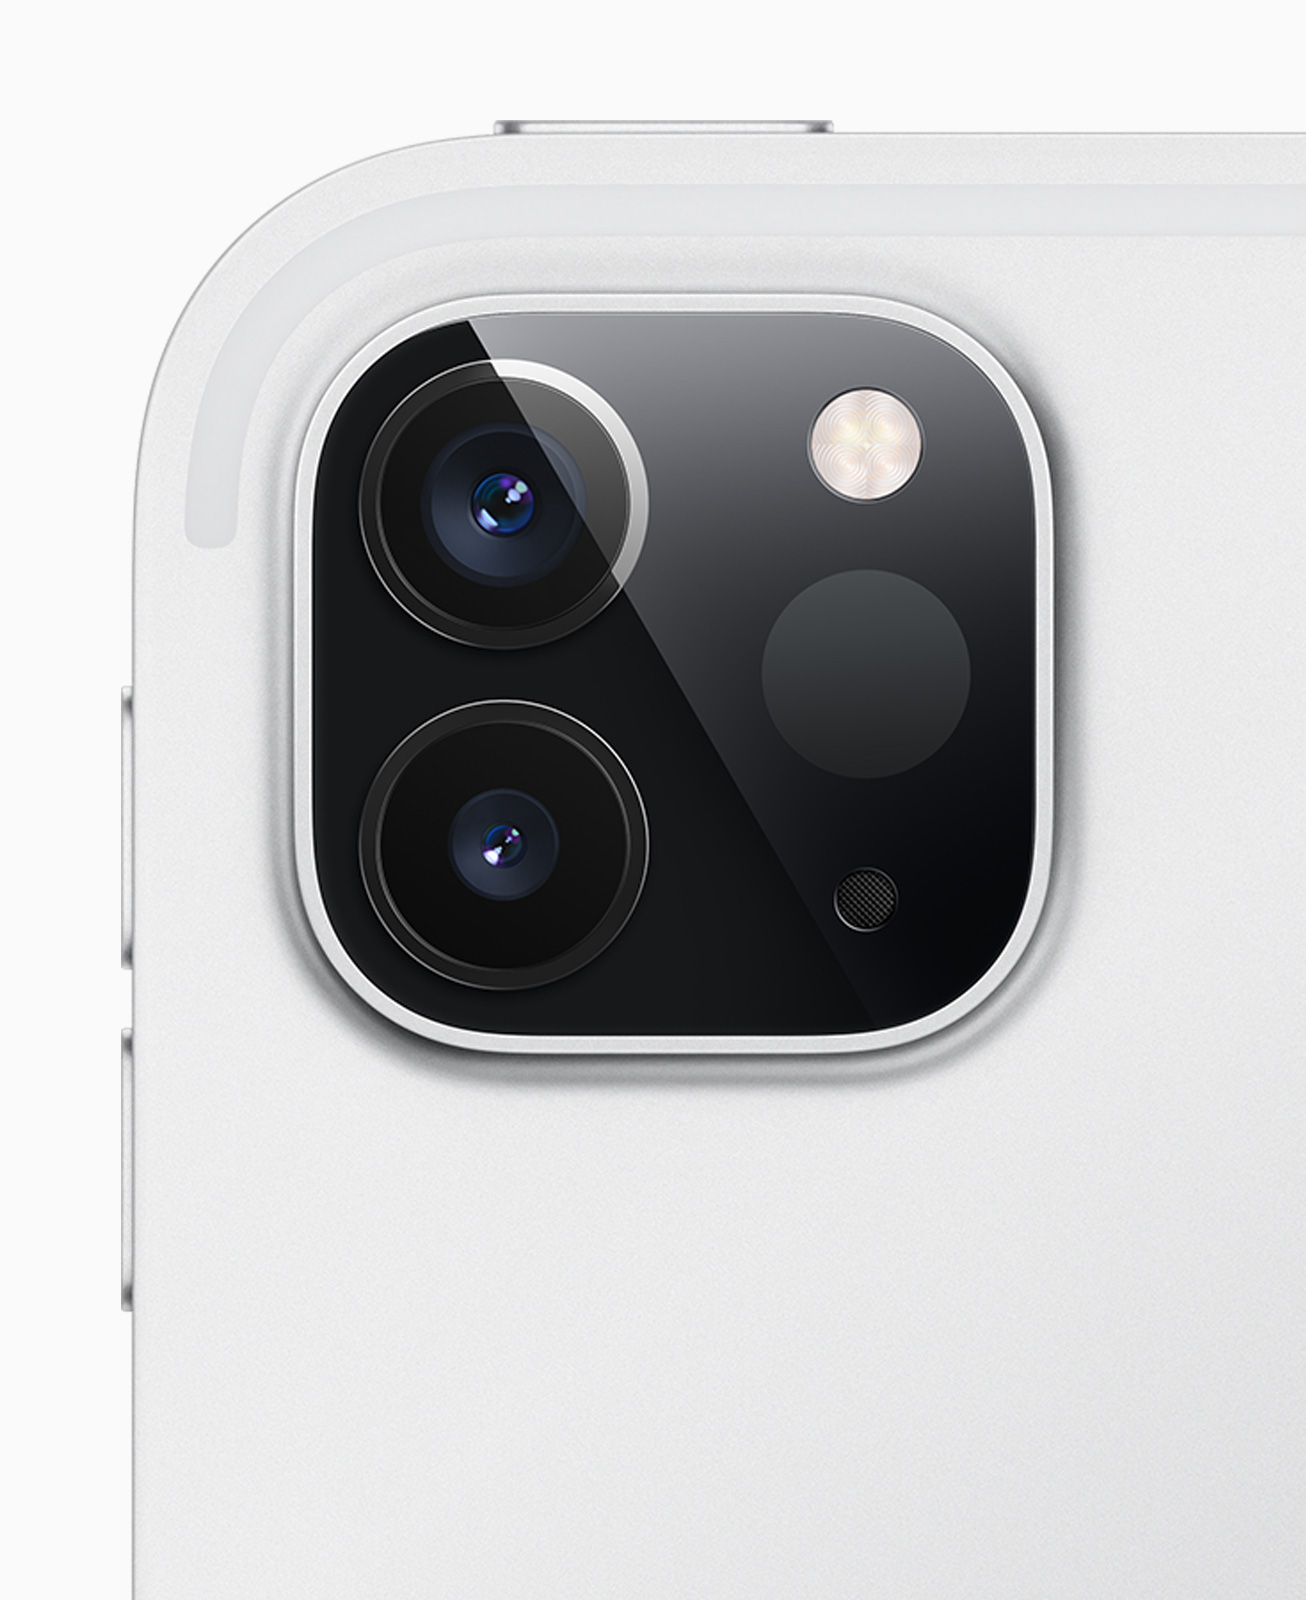 Apple_new-ipad-pro-ultra-wide-camera_03182020_inline.jpg.large_2x.jpg (1306×1600)